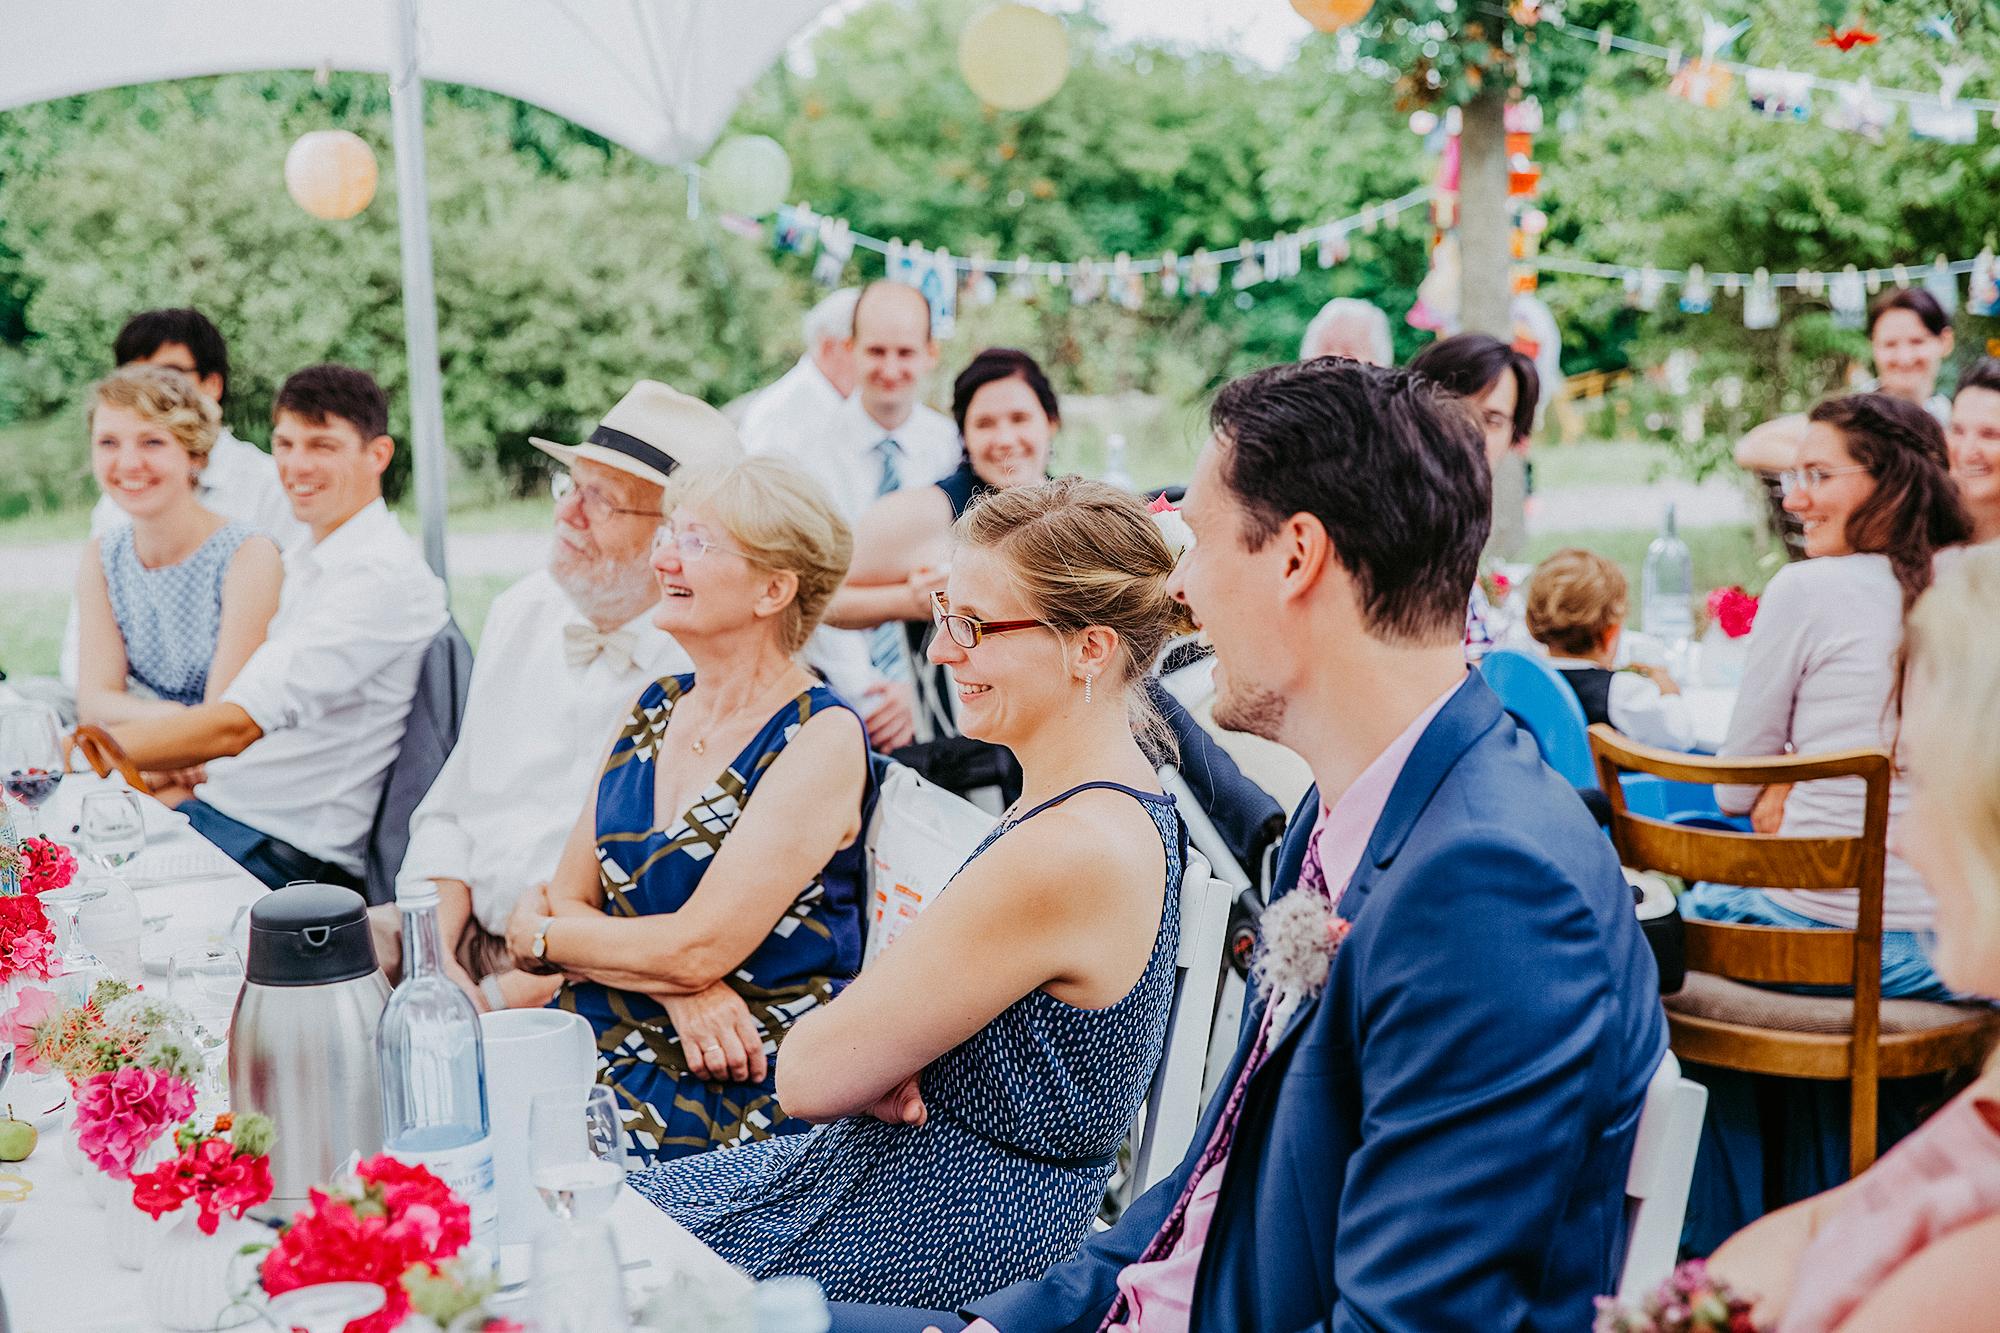 Hochzeit_Potsdam_fotograf_G34_5